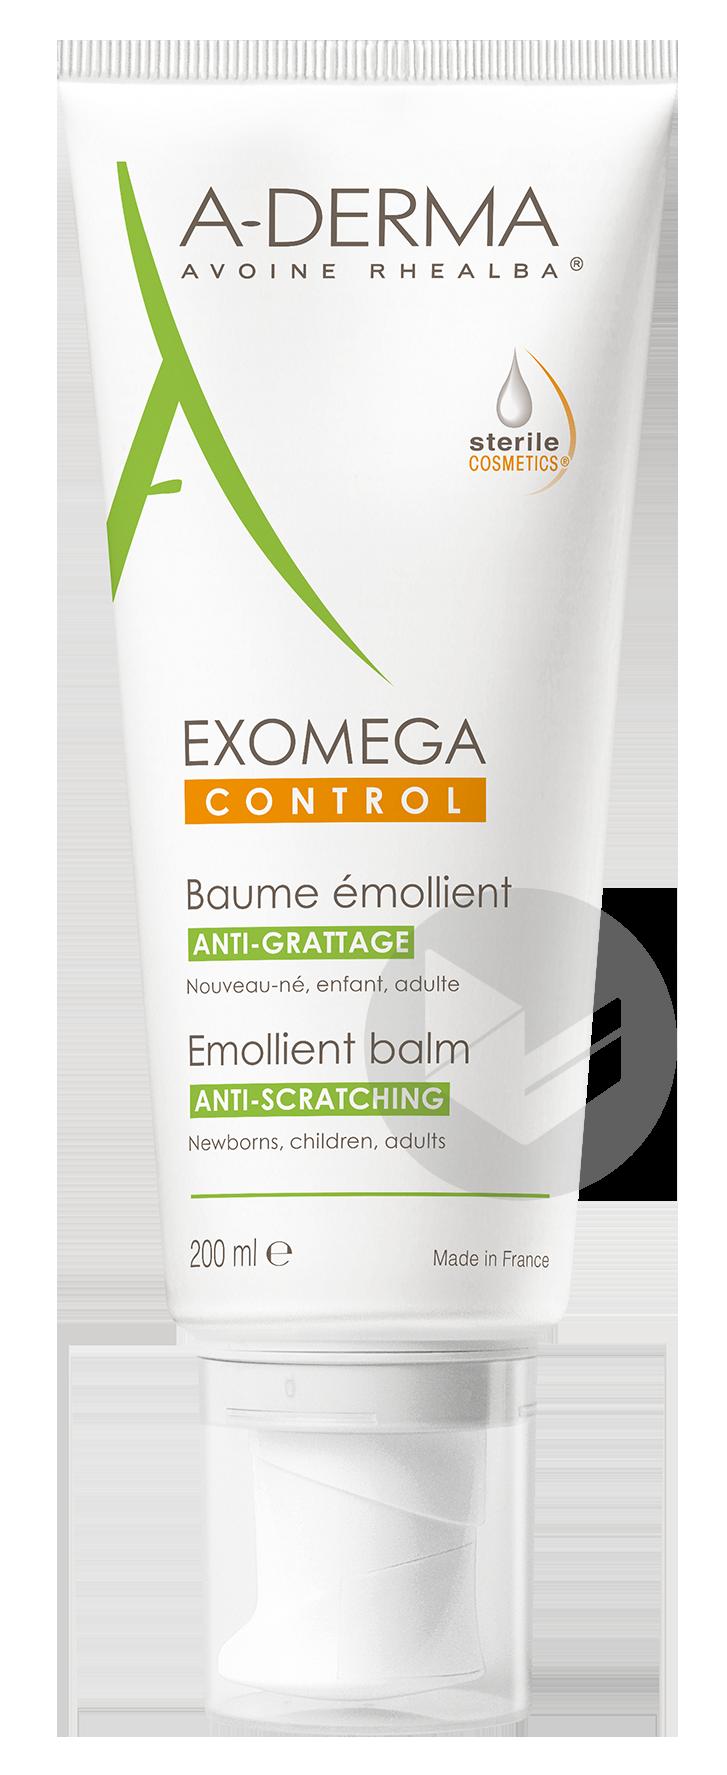 A Derma Exomega Control Baume Emollient Anti Grattage 200 Ml